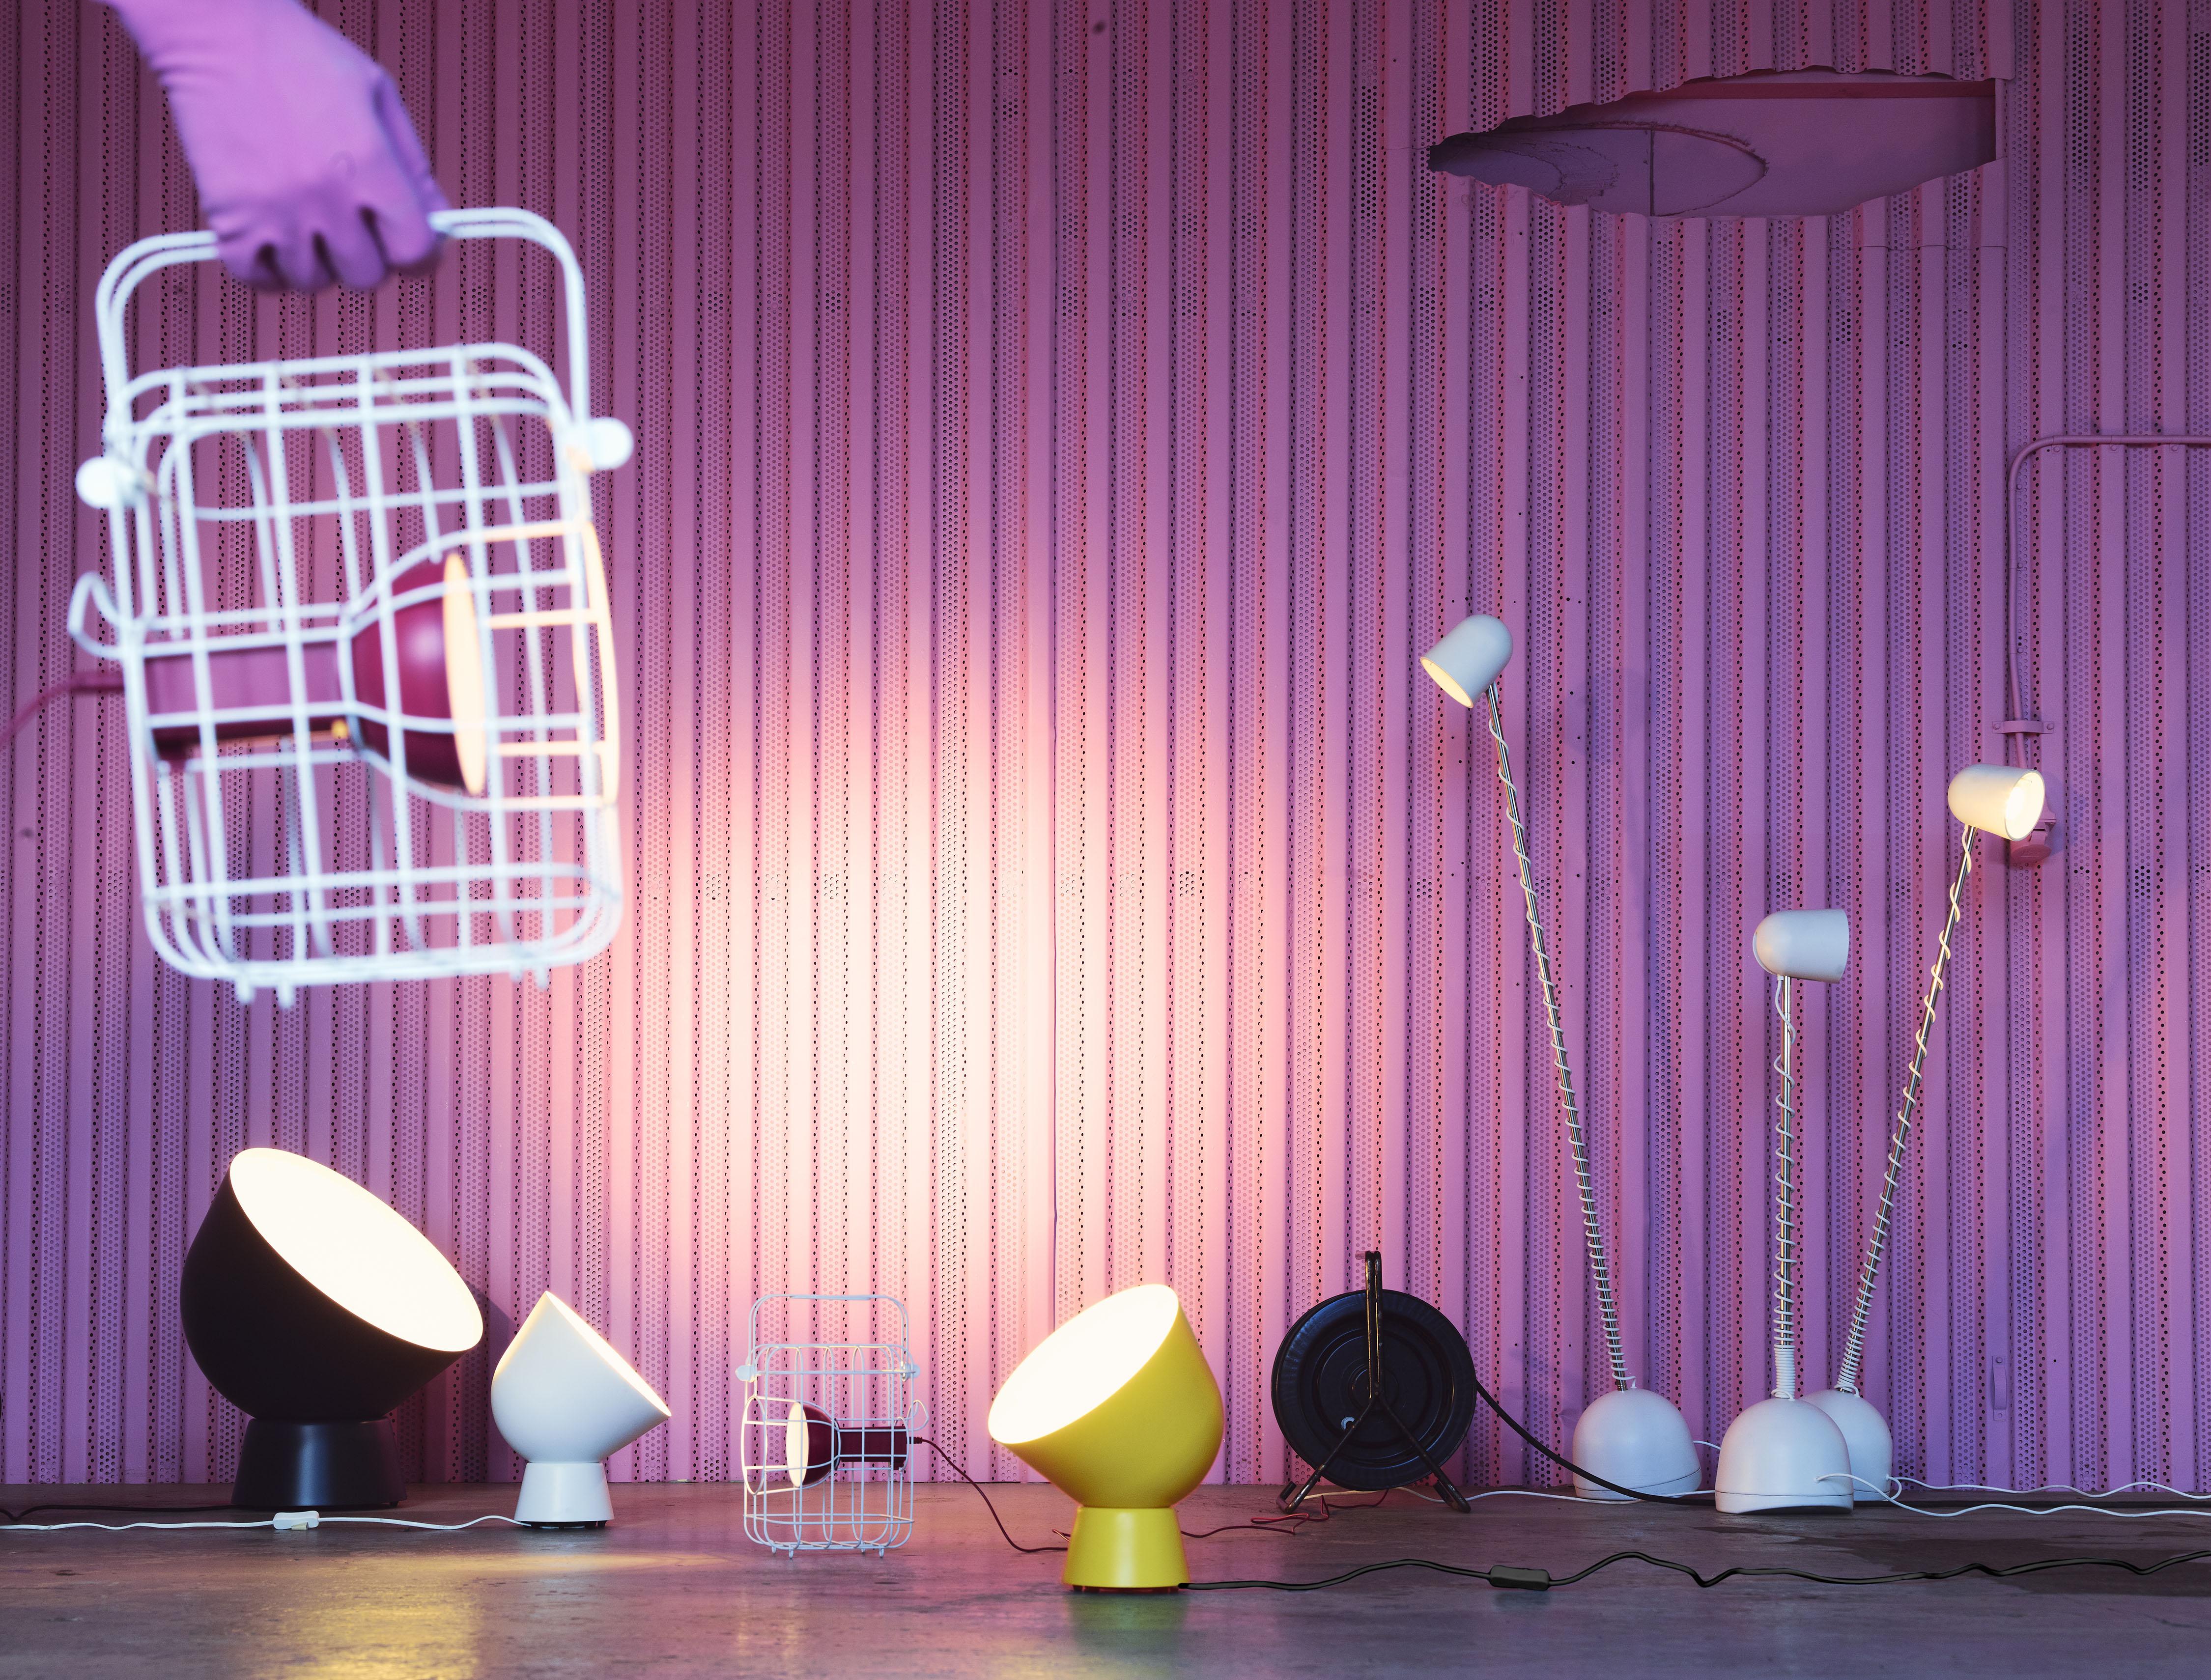 Ongekend IKEA lanceert nieuwe LED-verlichting - Lifestylelady.nl PD-04